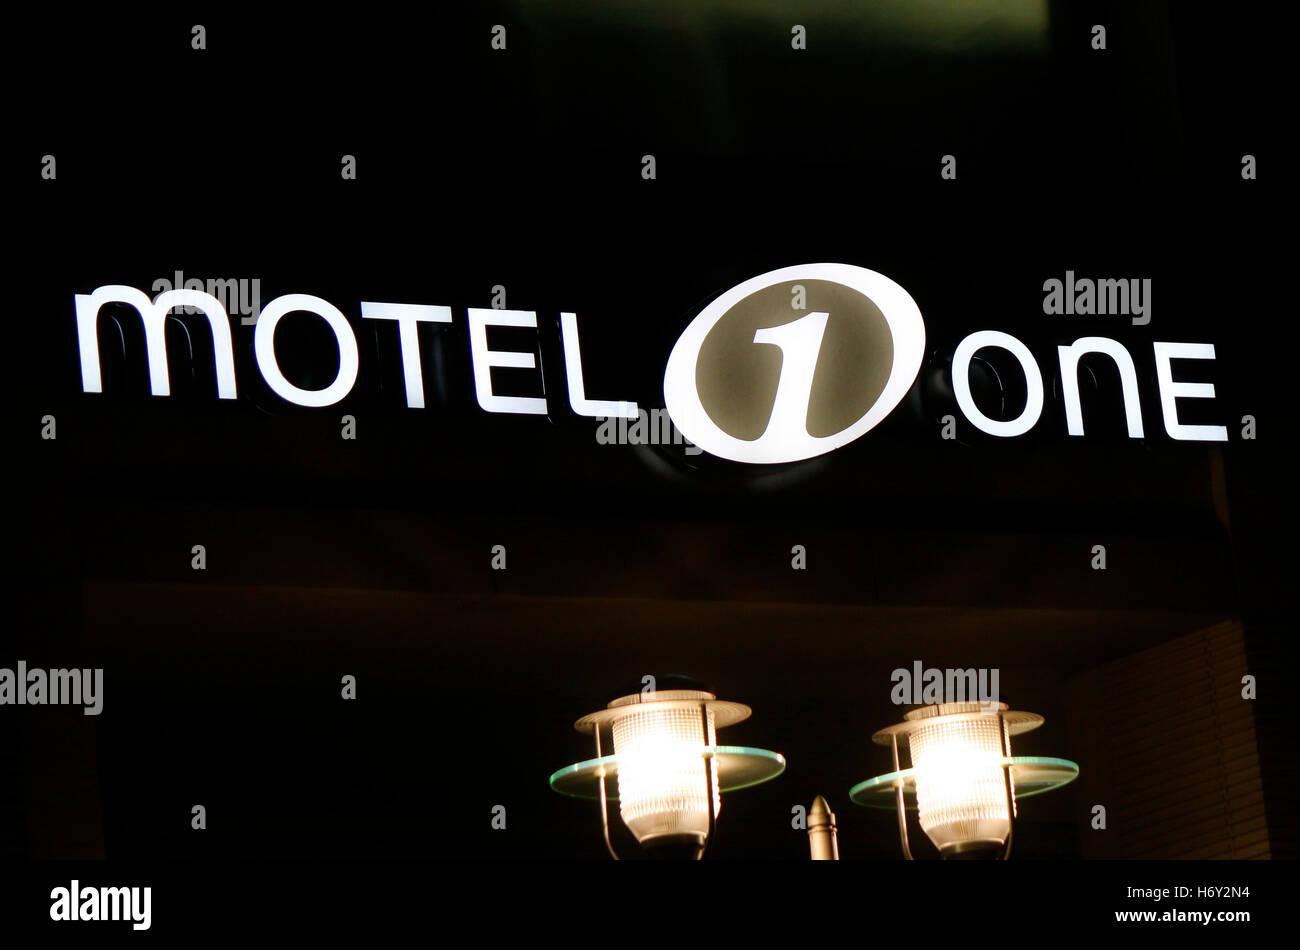 das Logo der Marke 'Motel One', Berlin. - Stock Image